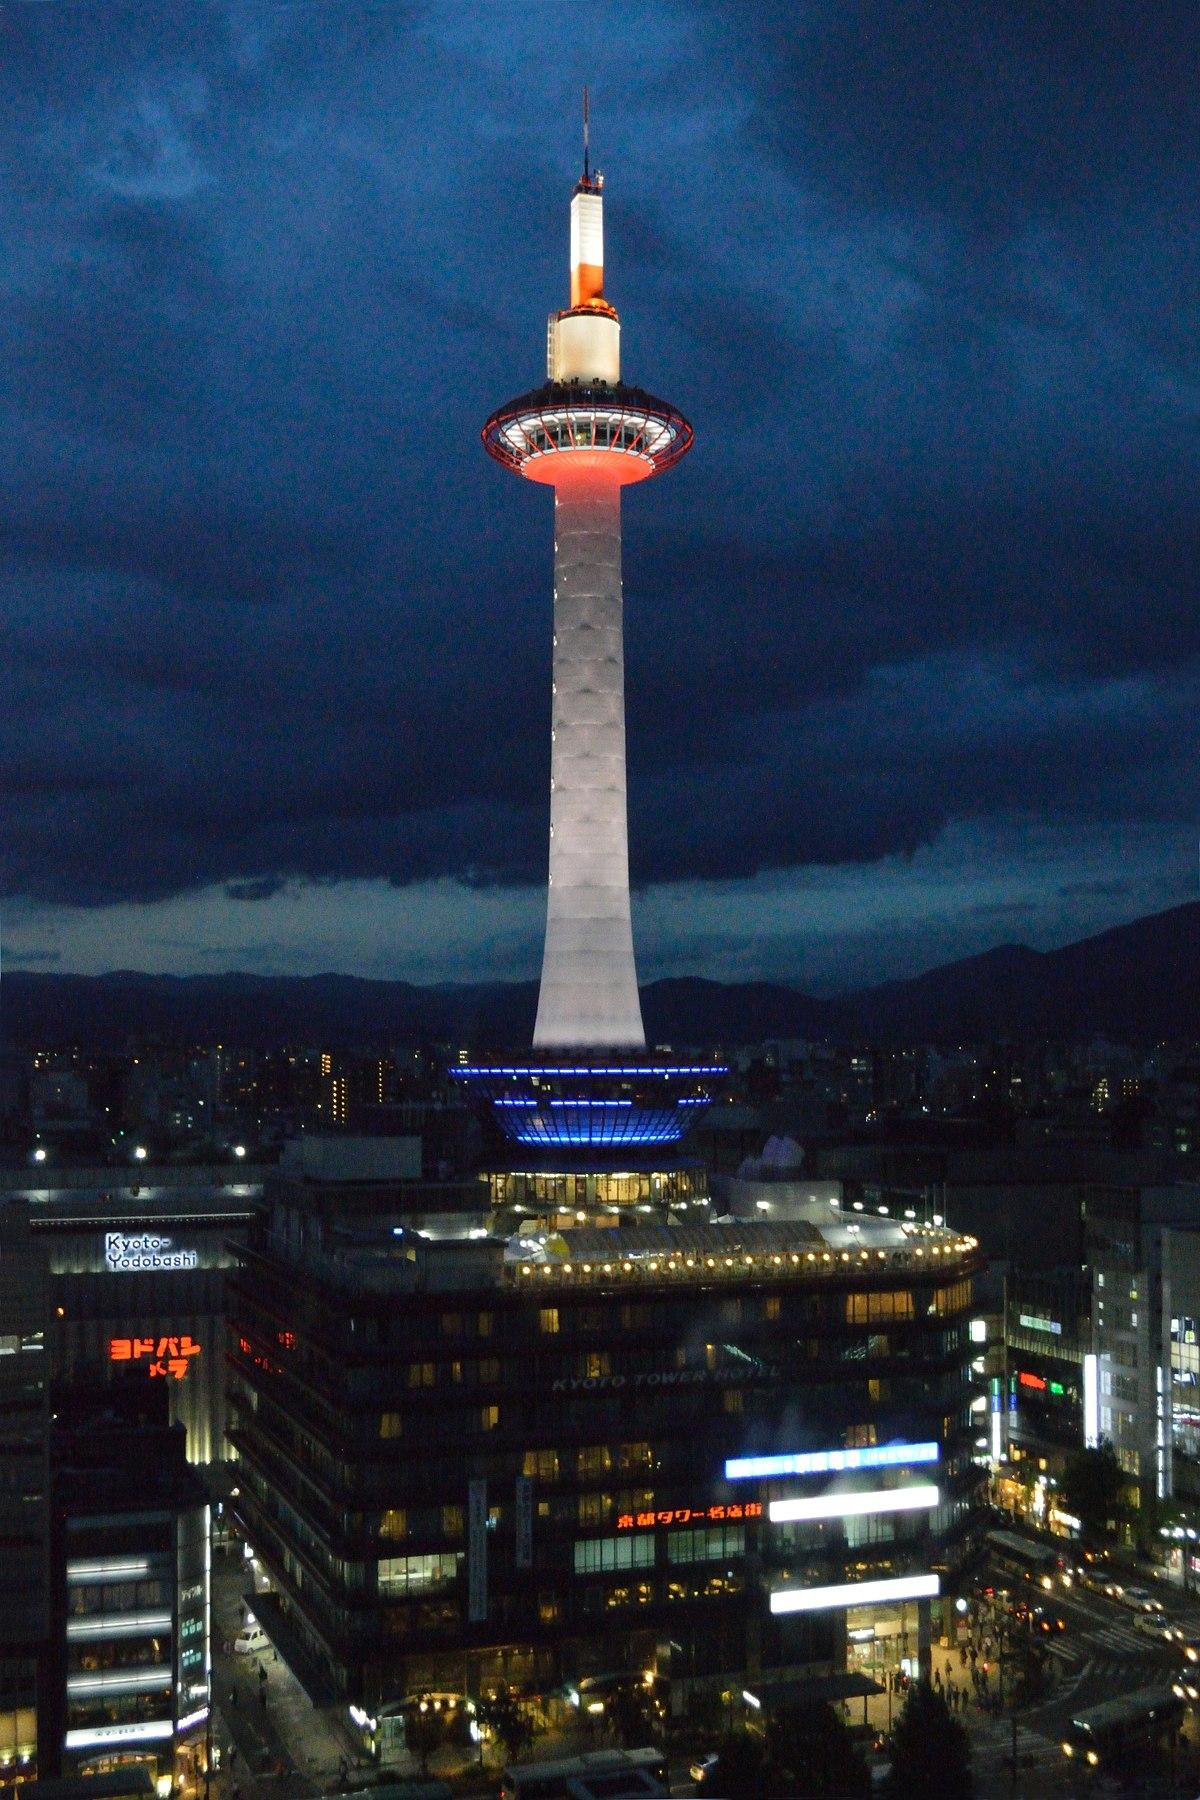 Kyoto Tower - Wikipedia